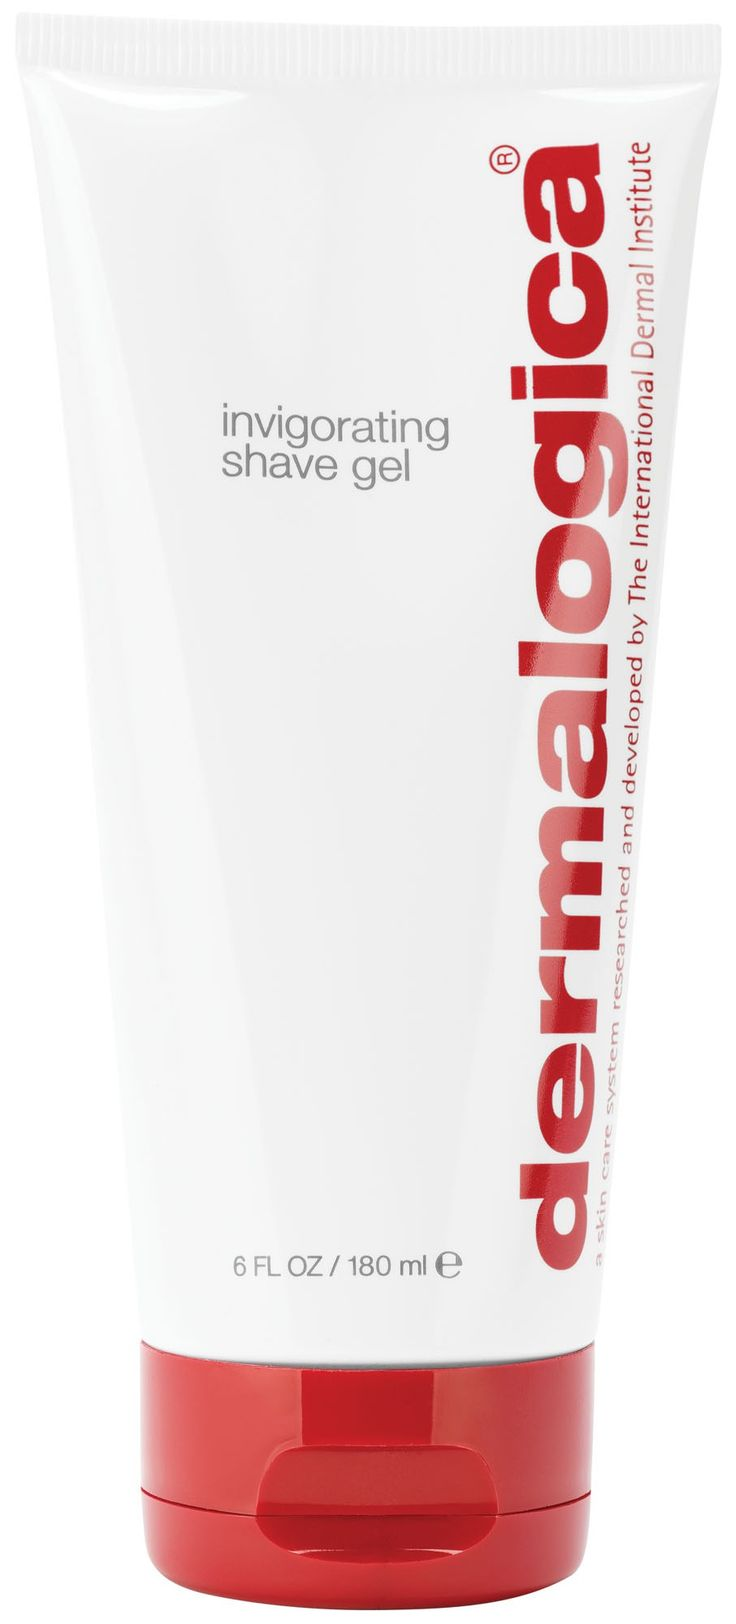 Invigorating Shave Gel 177ml - shave - my SKIN SYSTEM